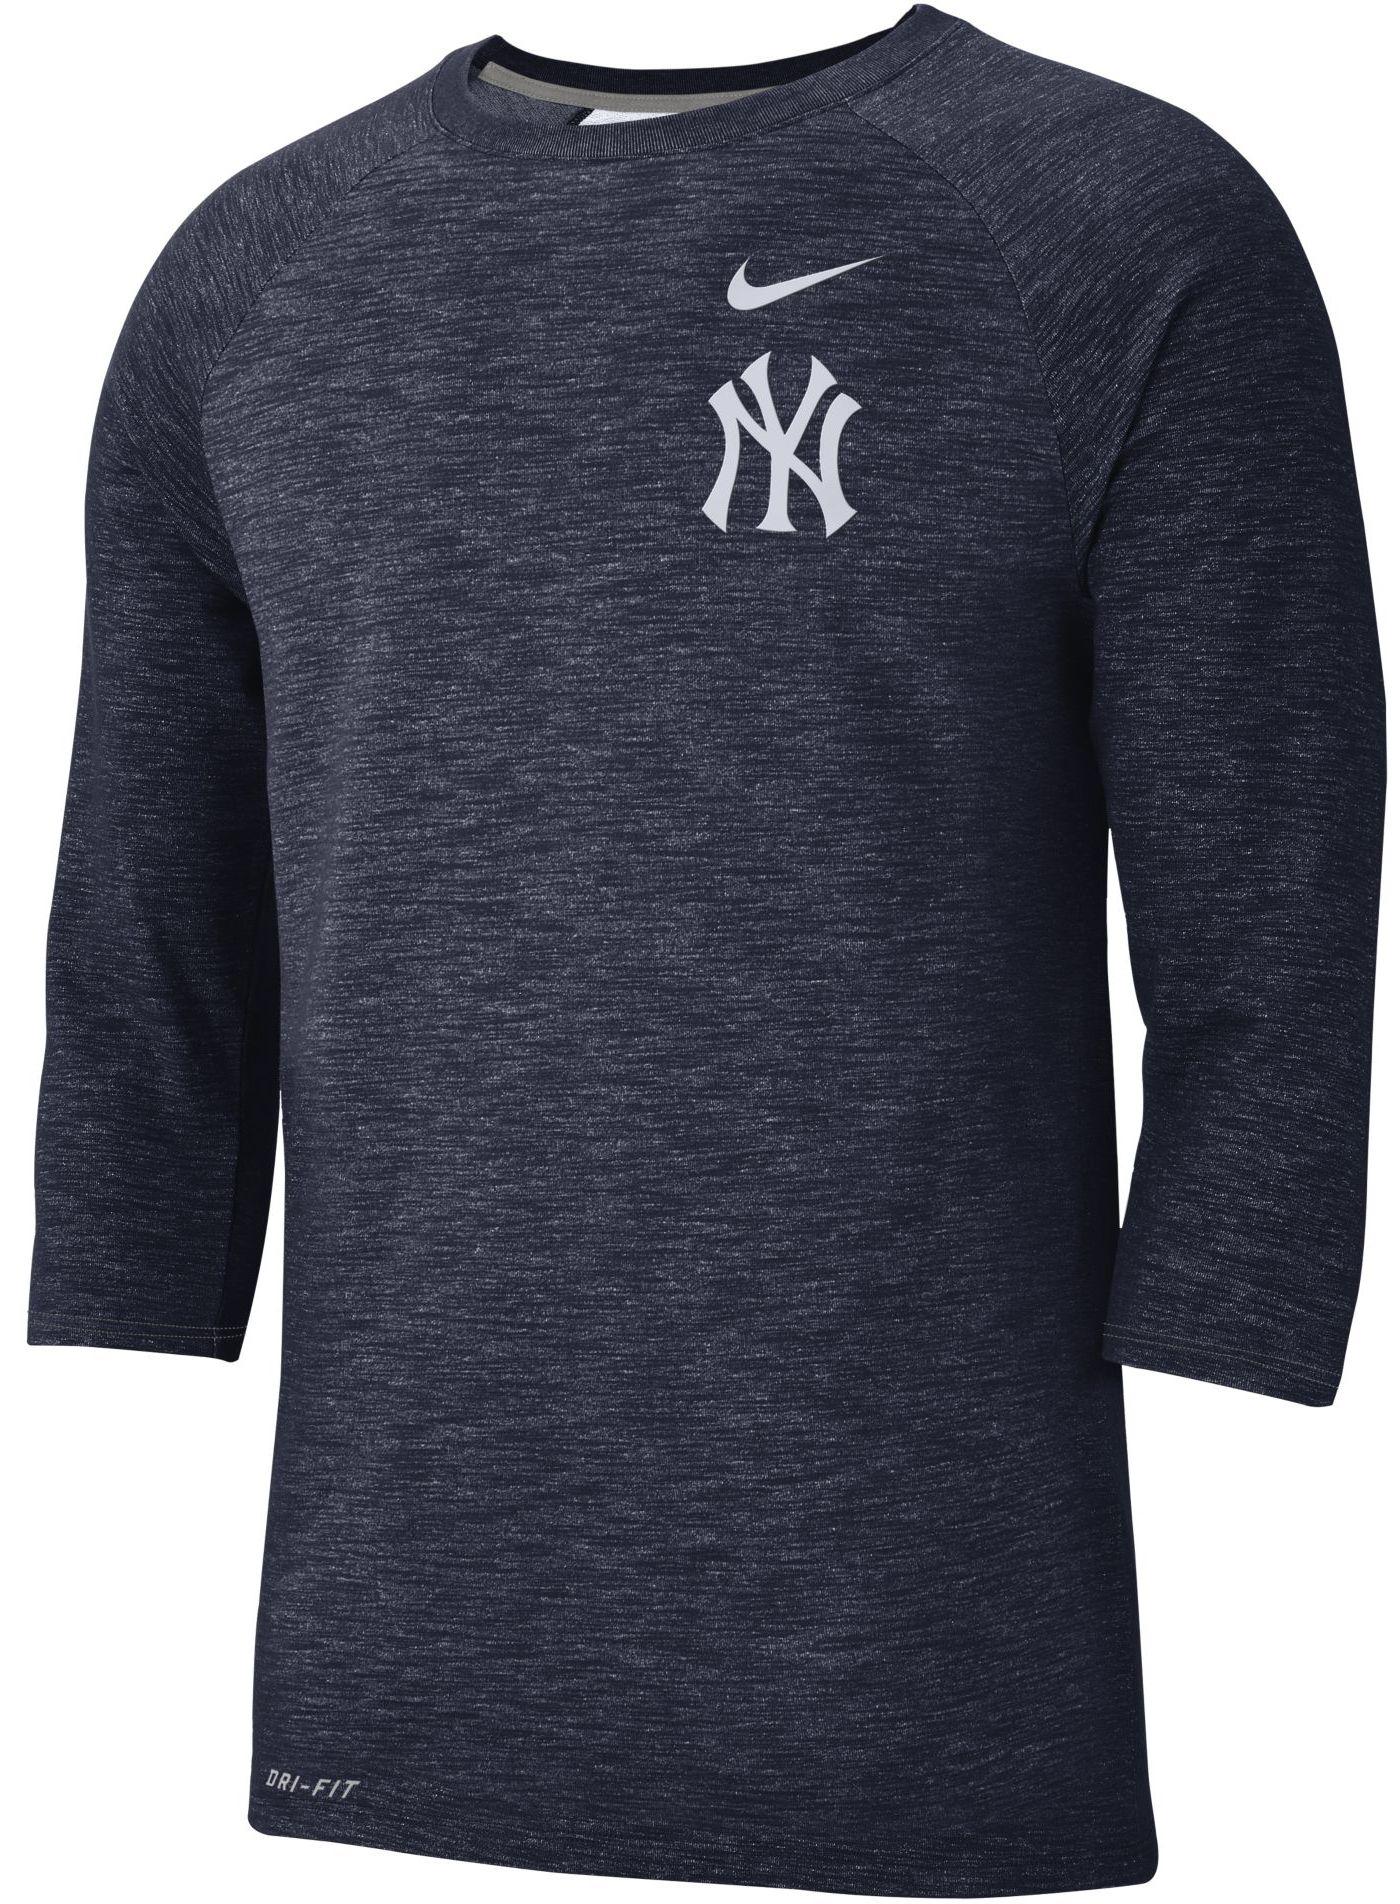 Nike Men's New York Yankees Dri-FIT Slub Three-Quarter Sleeve Shirt